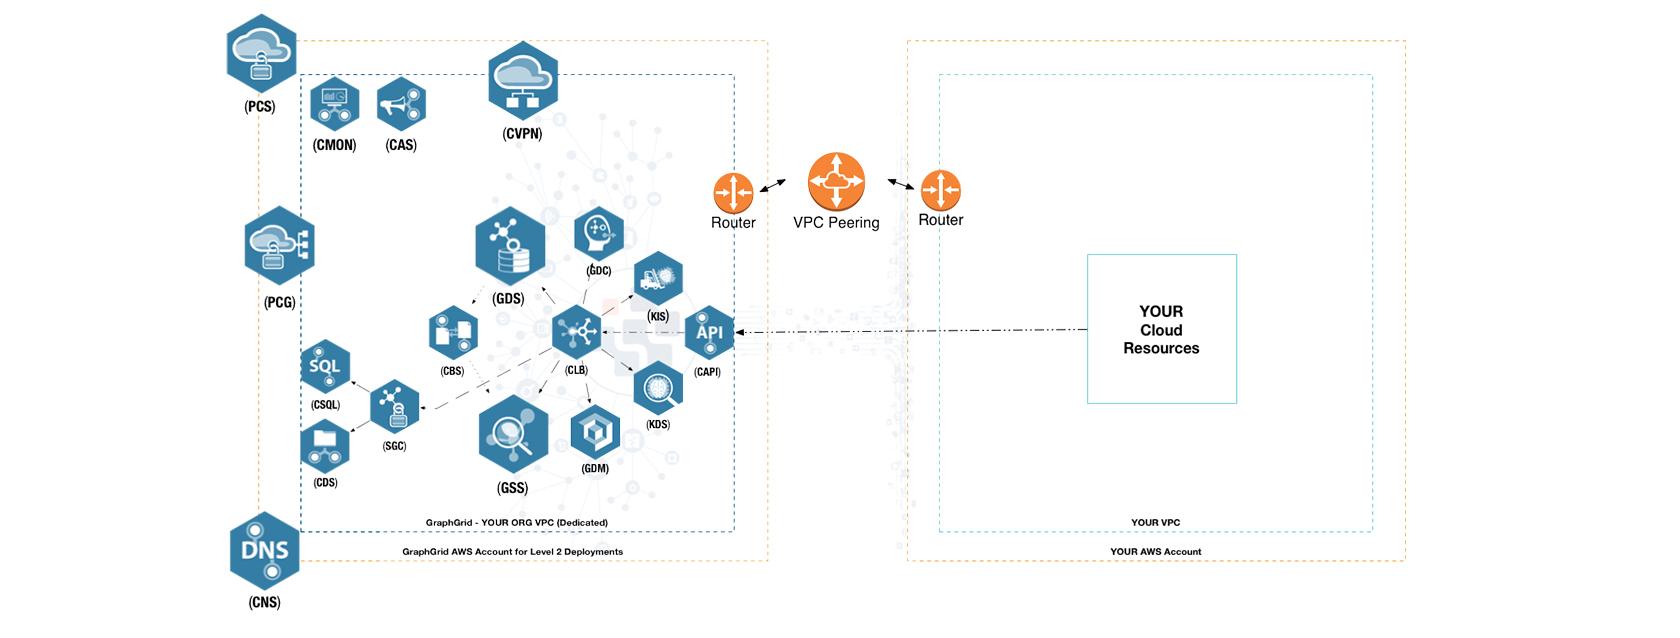 Connected Intelligence Platform Deployment